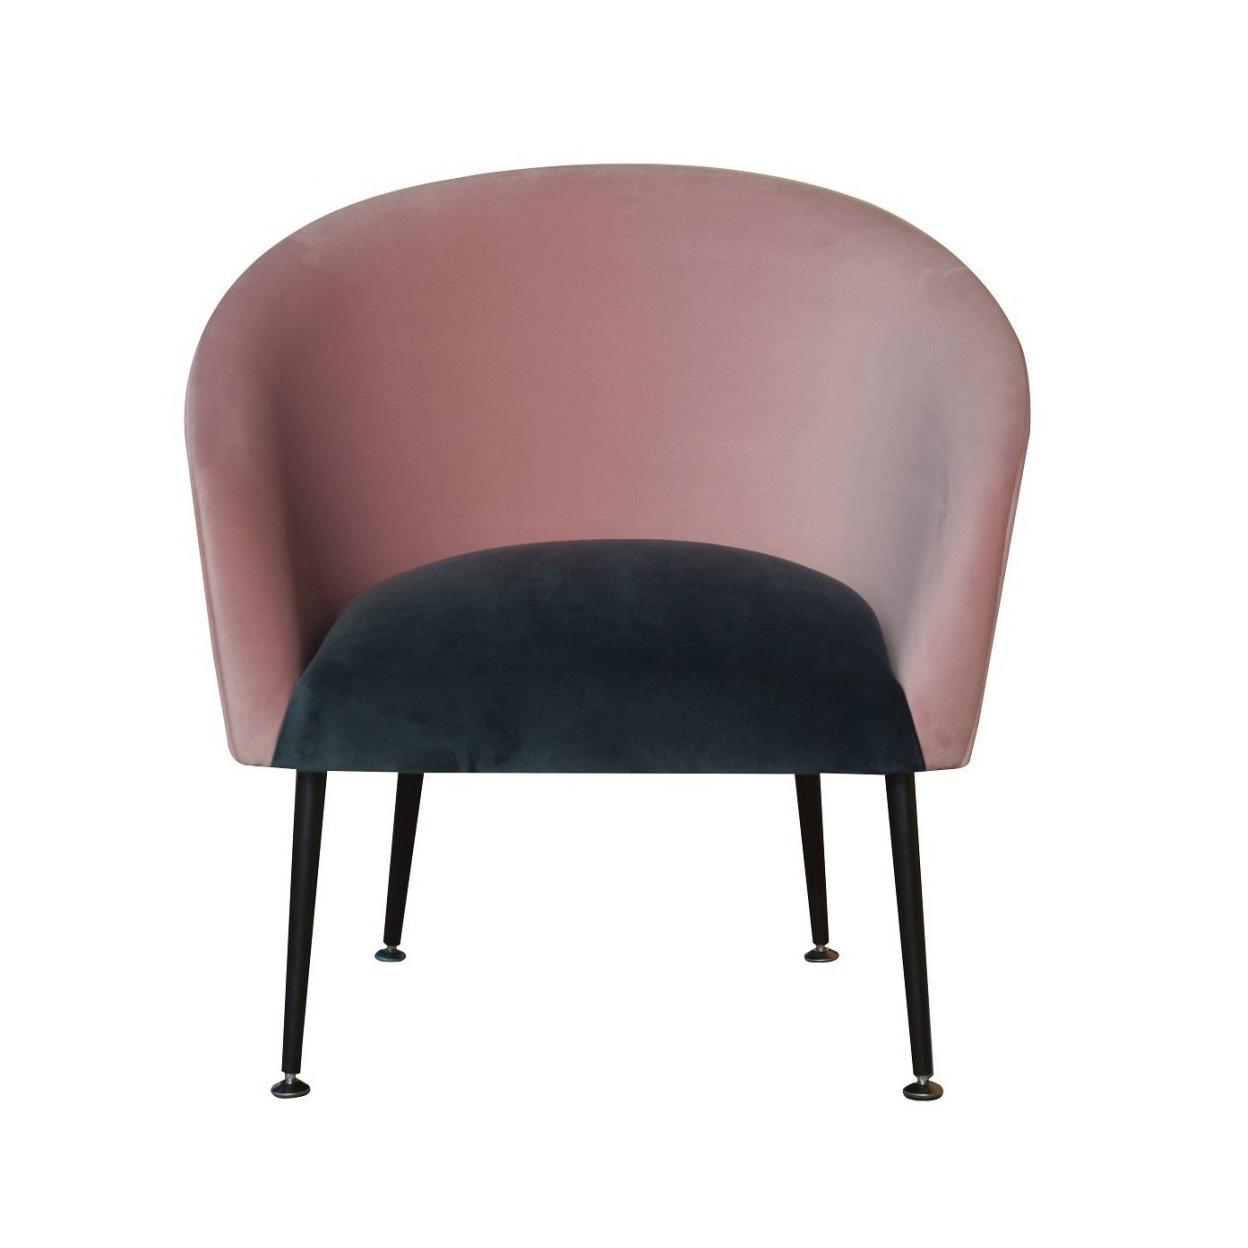 Fotel-Plum_[1795]_1200